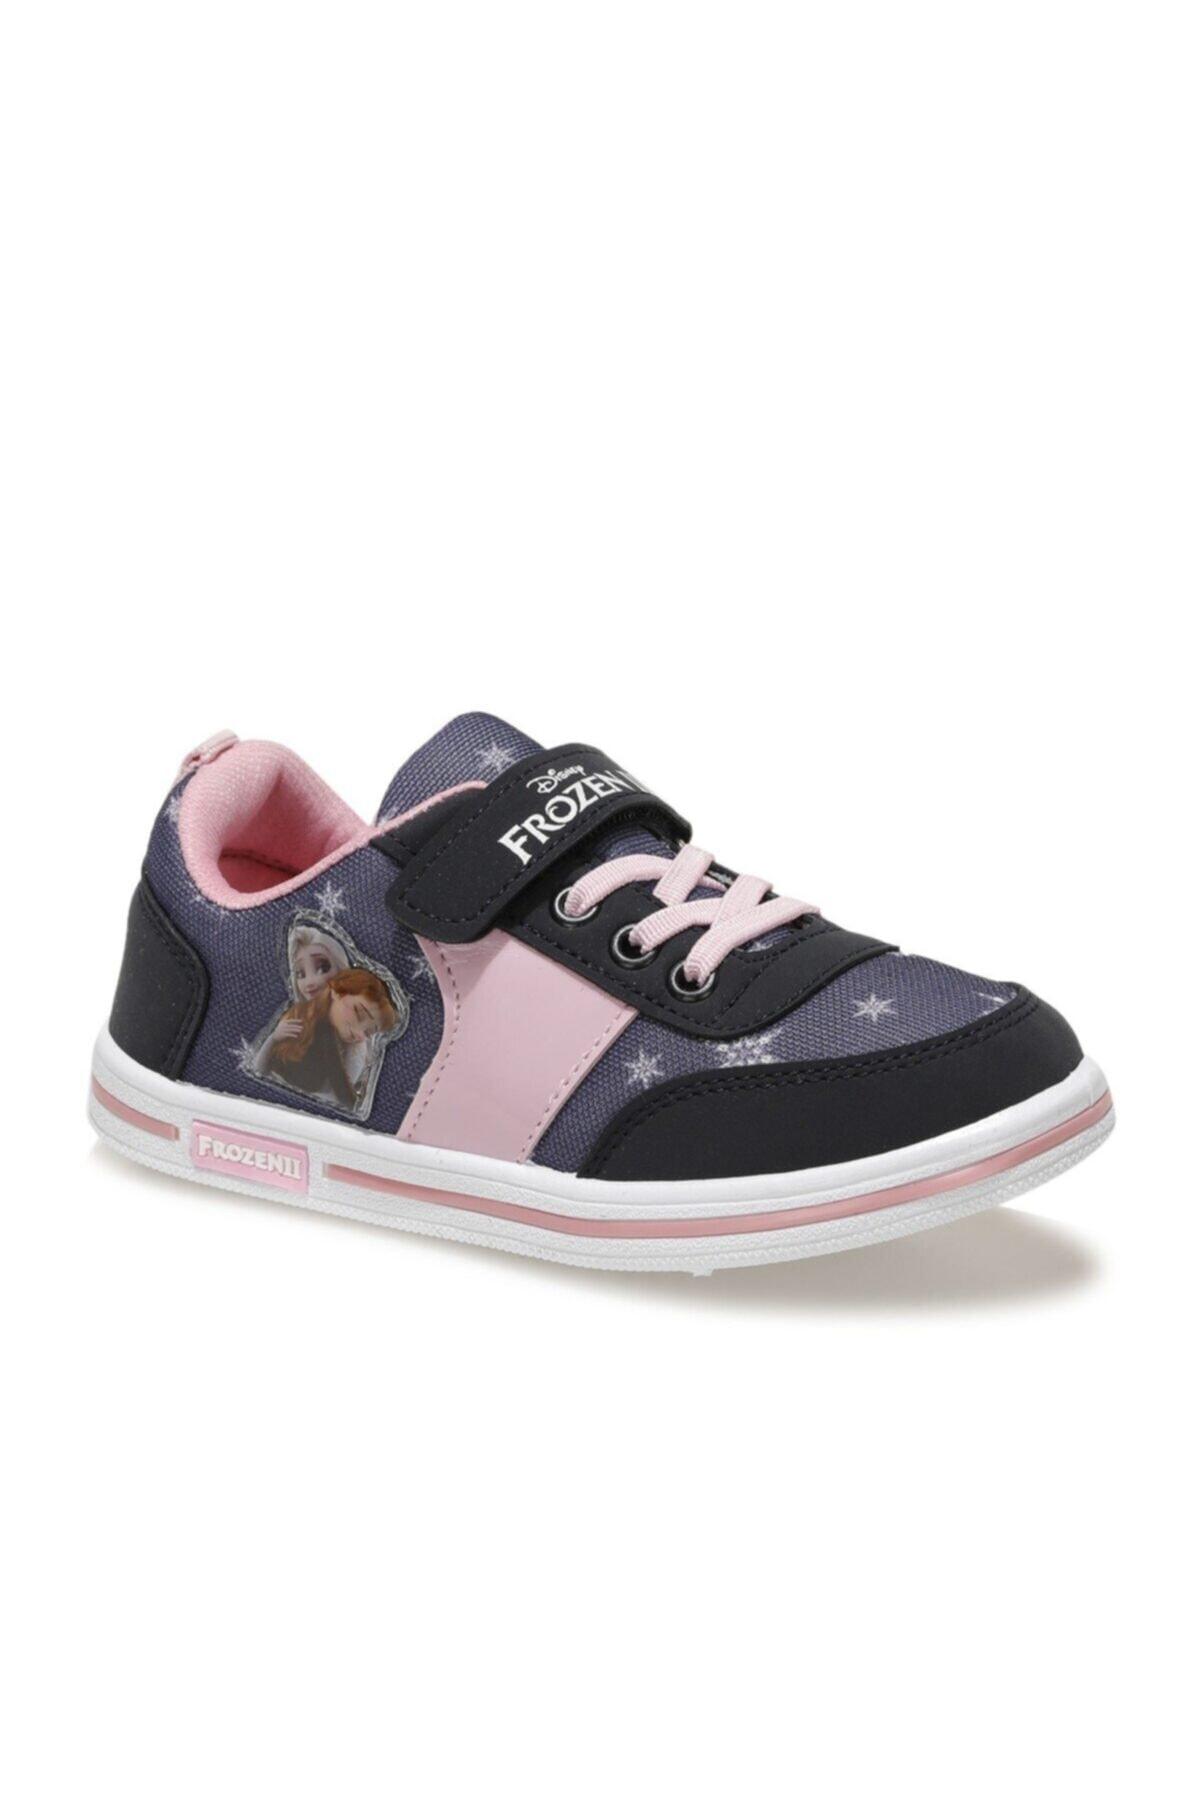 ALICE.F1FX Lacivert Kız Çocuk Sneaker 101012753